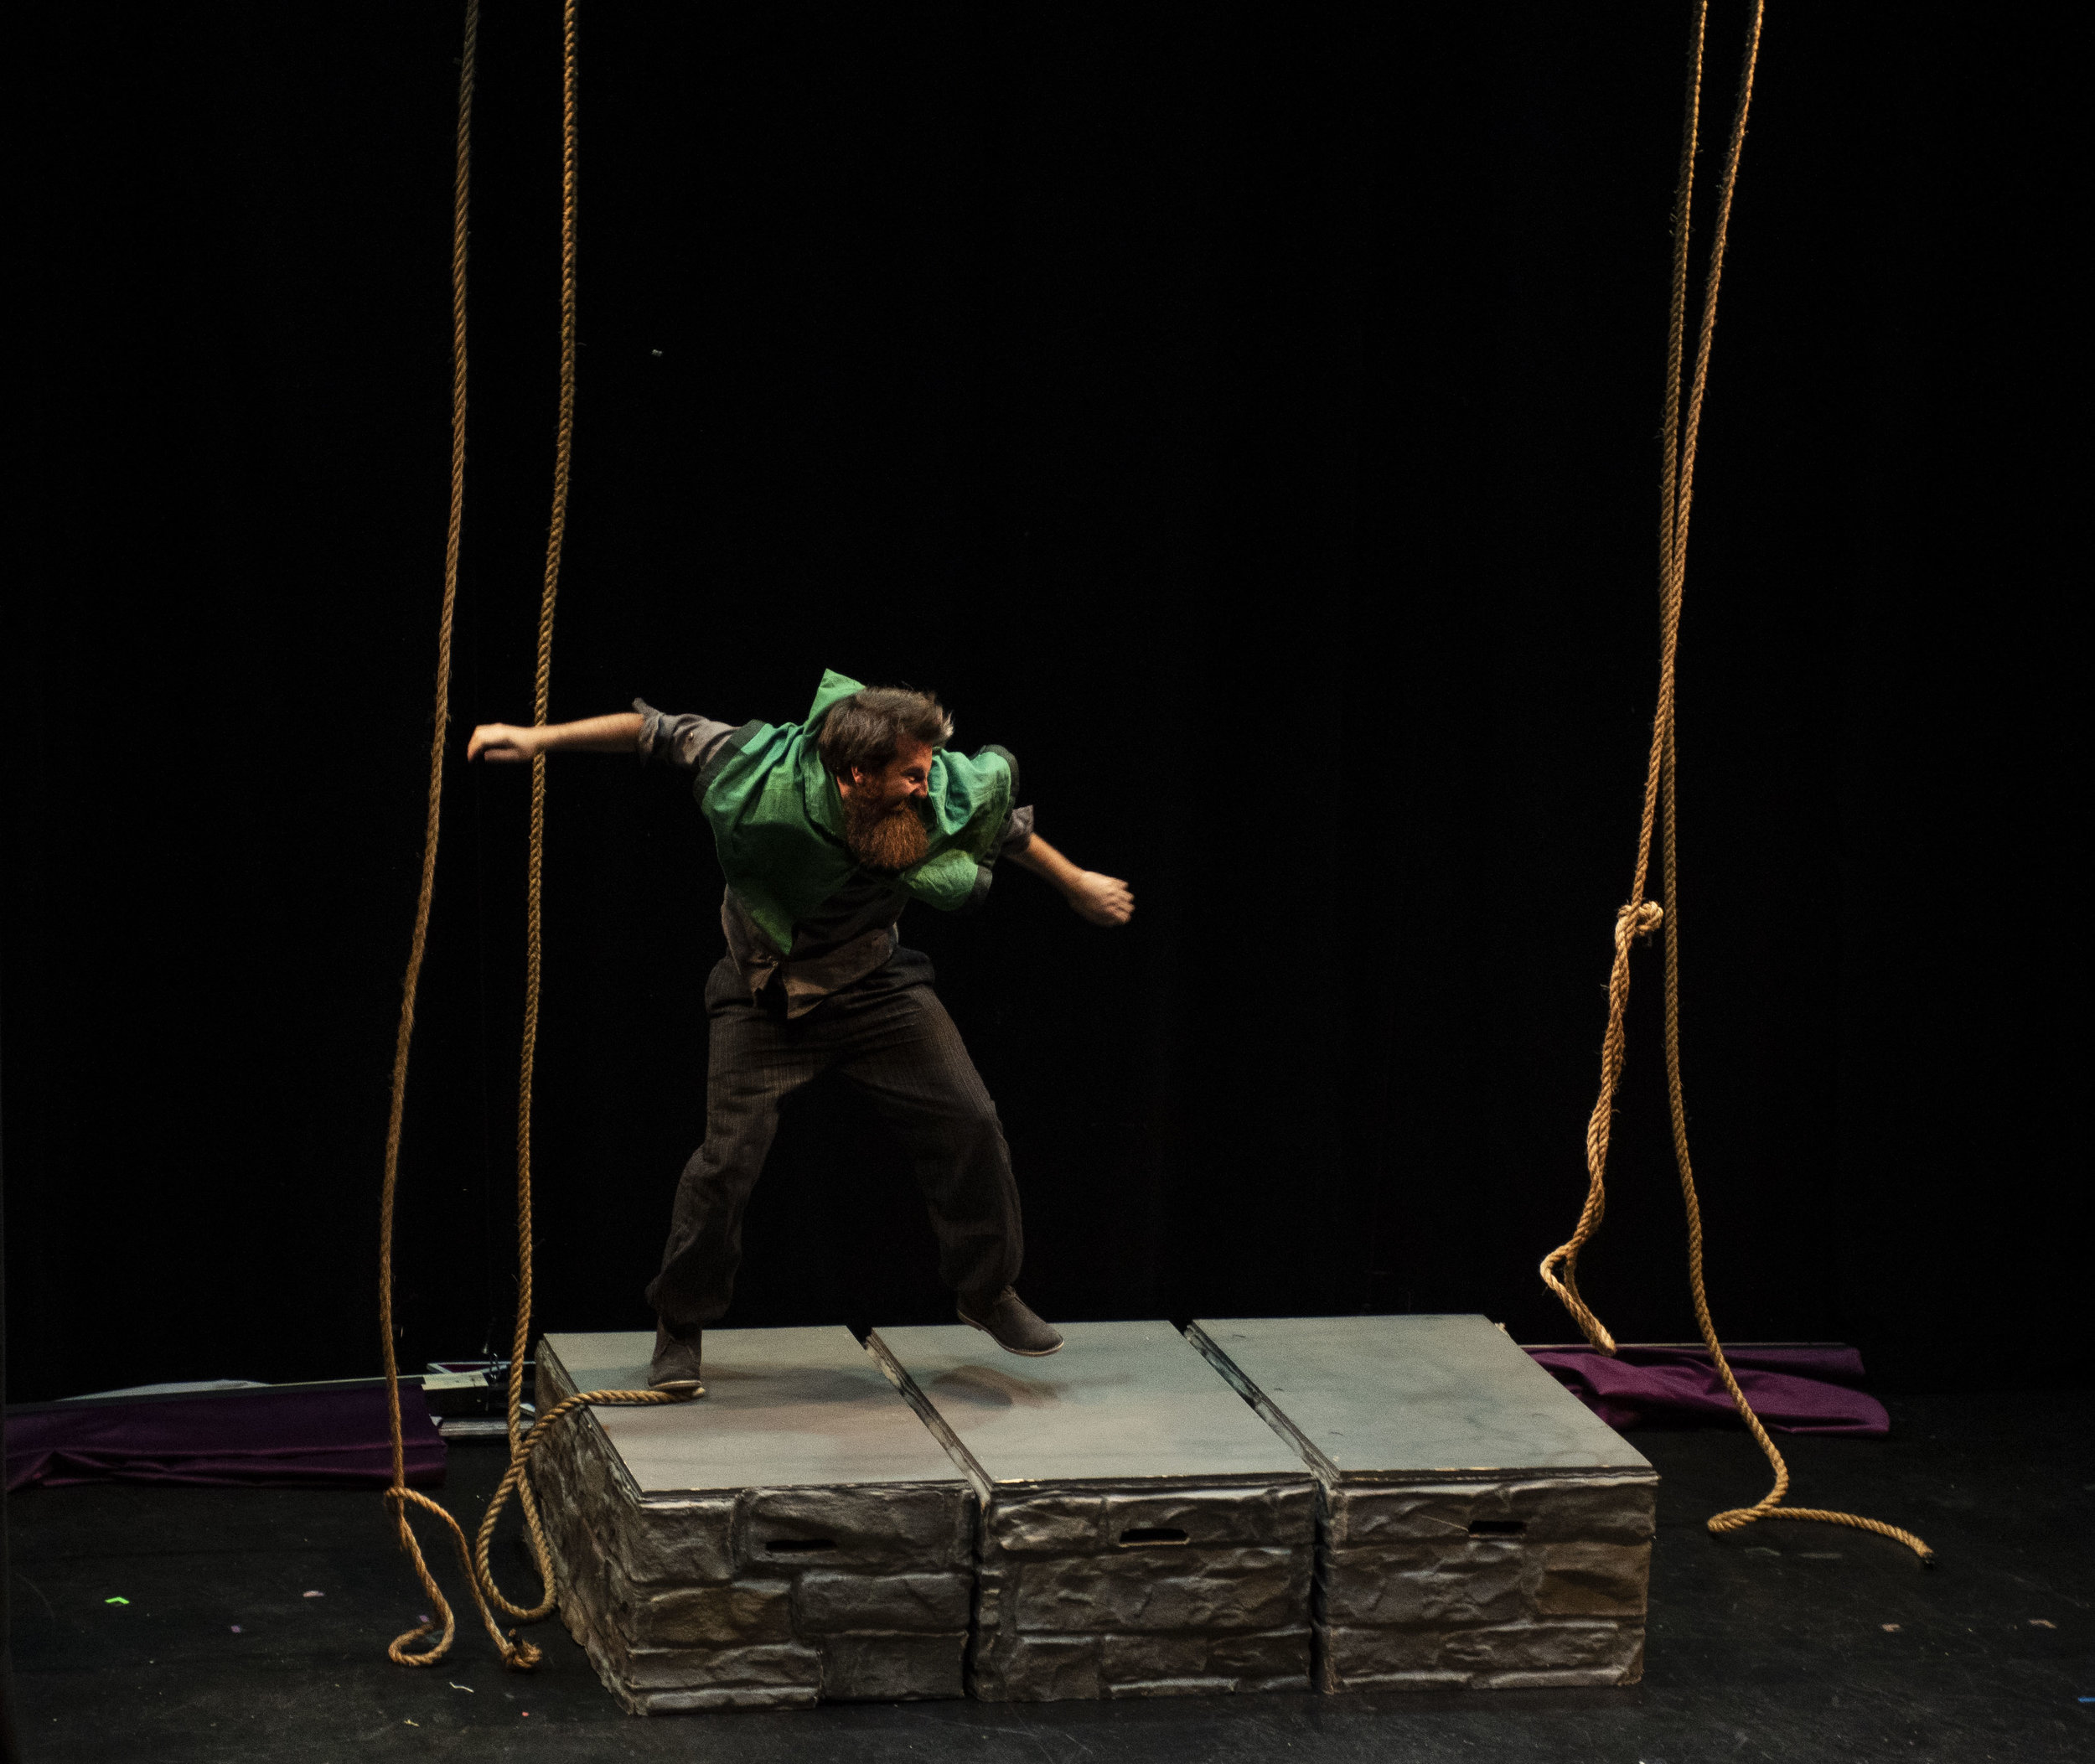 Andrew Morrill (Quasimodo) with his bells Dancing Girl by Shoshana @bwaySHO.jpg